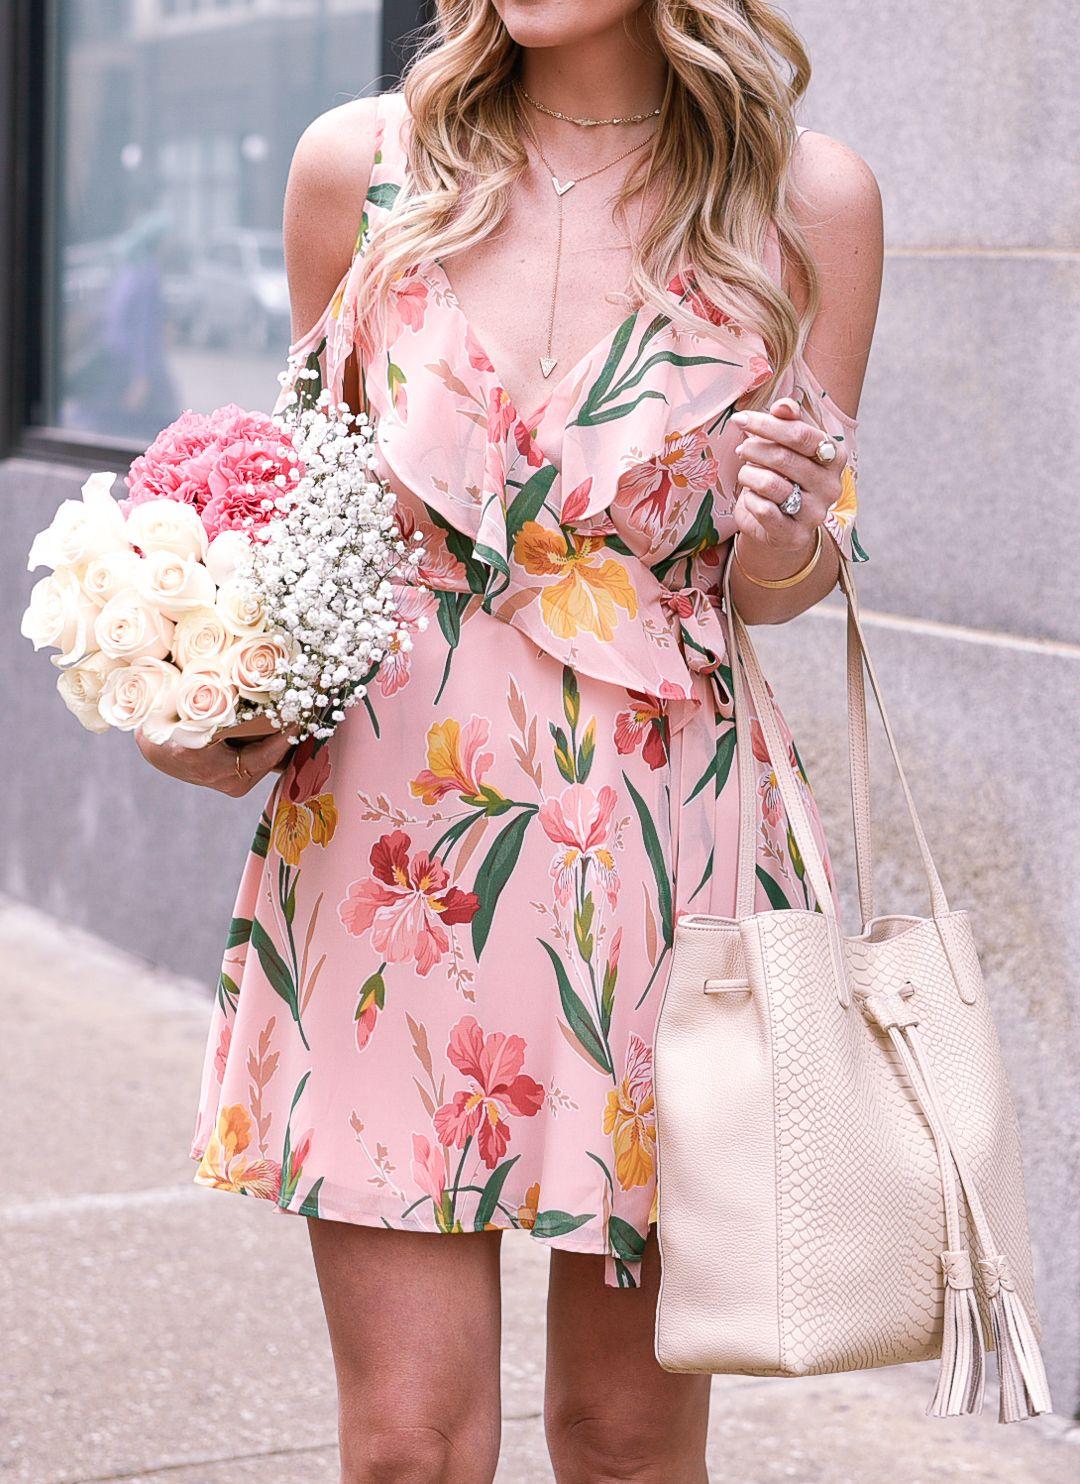 Pink Floral Wrap Dress Visions Of Vogue Chic Summer Outfits Wrap Dress Floral Dresses [ 1484 x 1080 Pixel ]